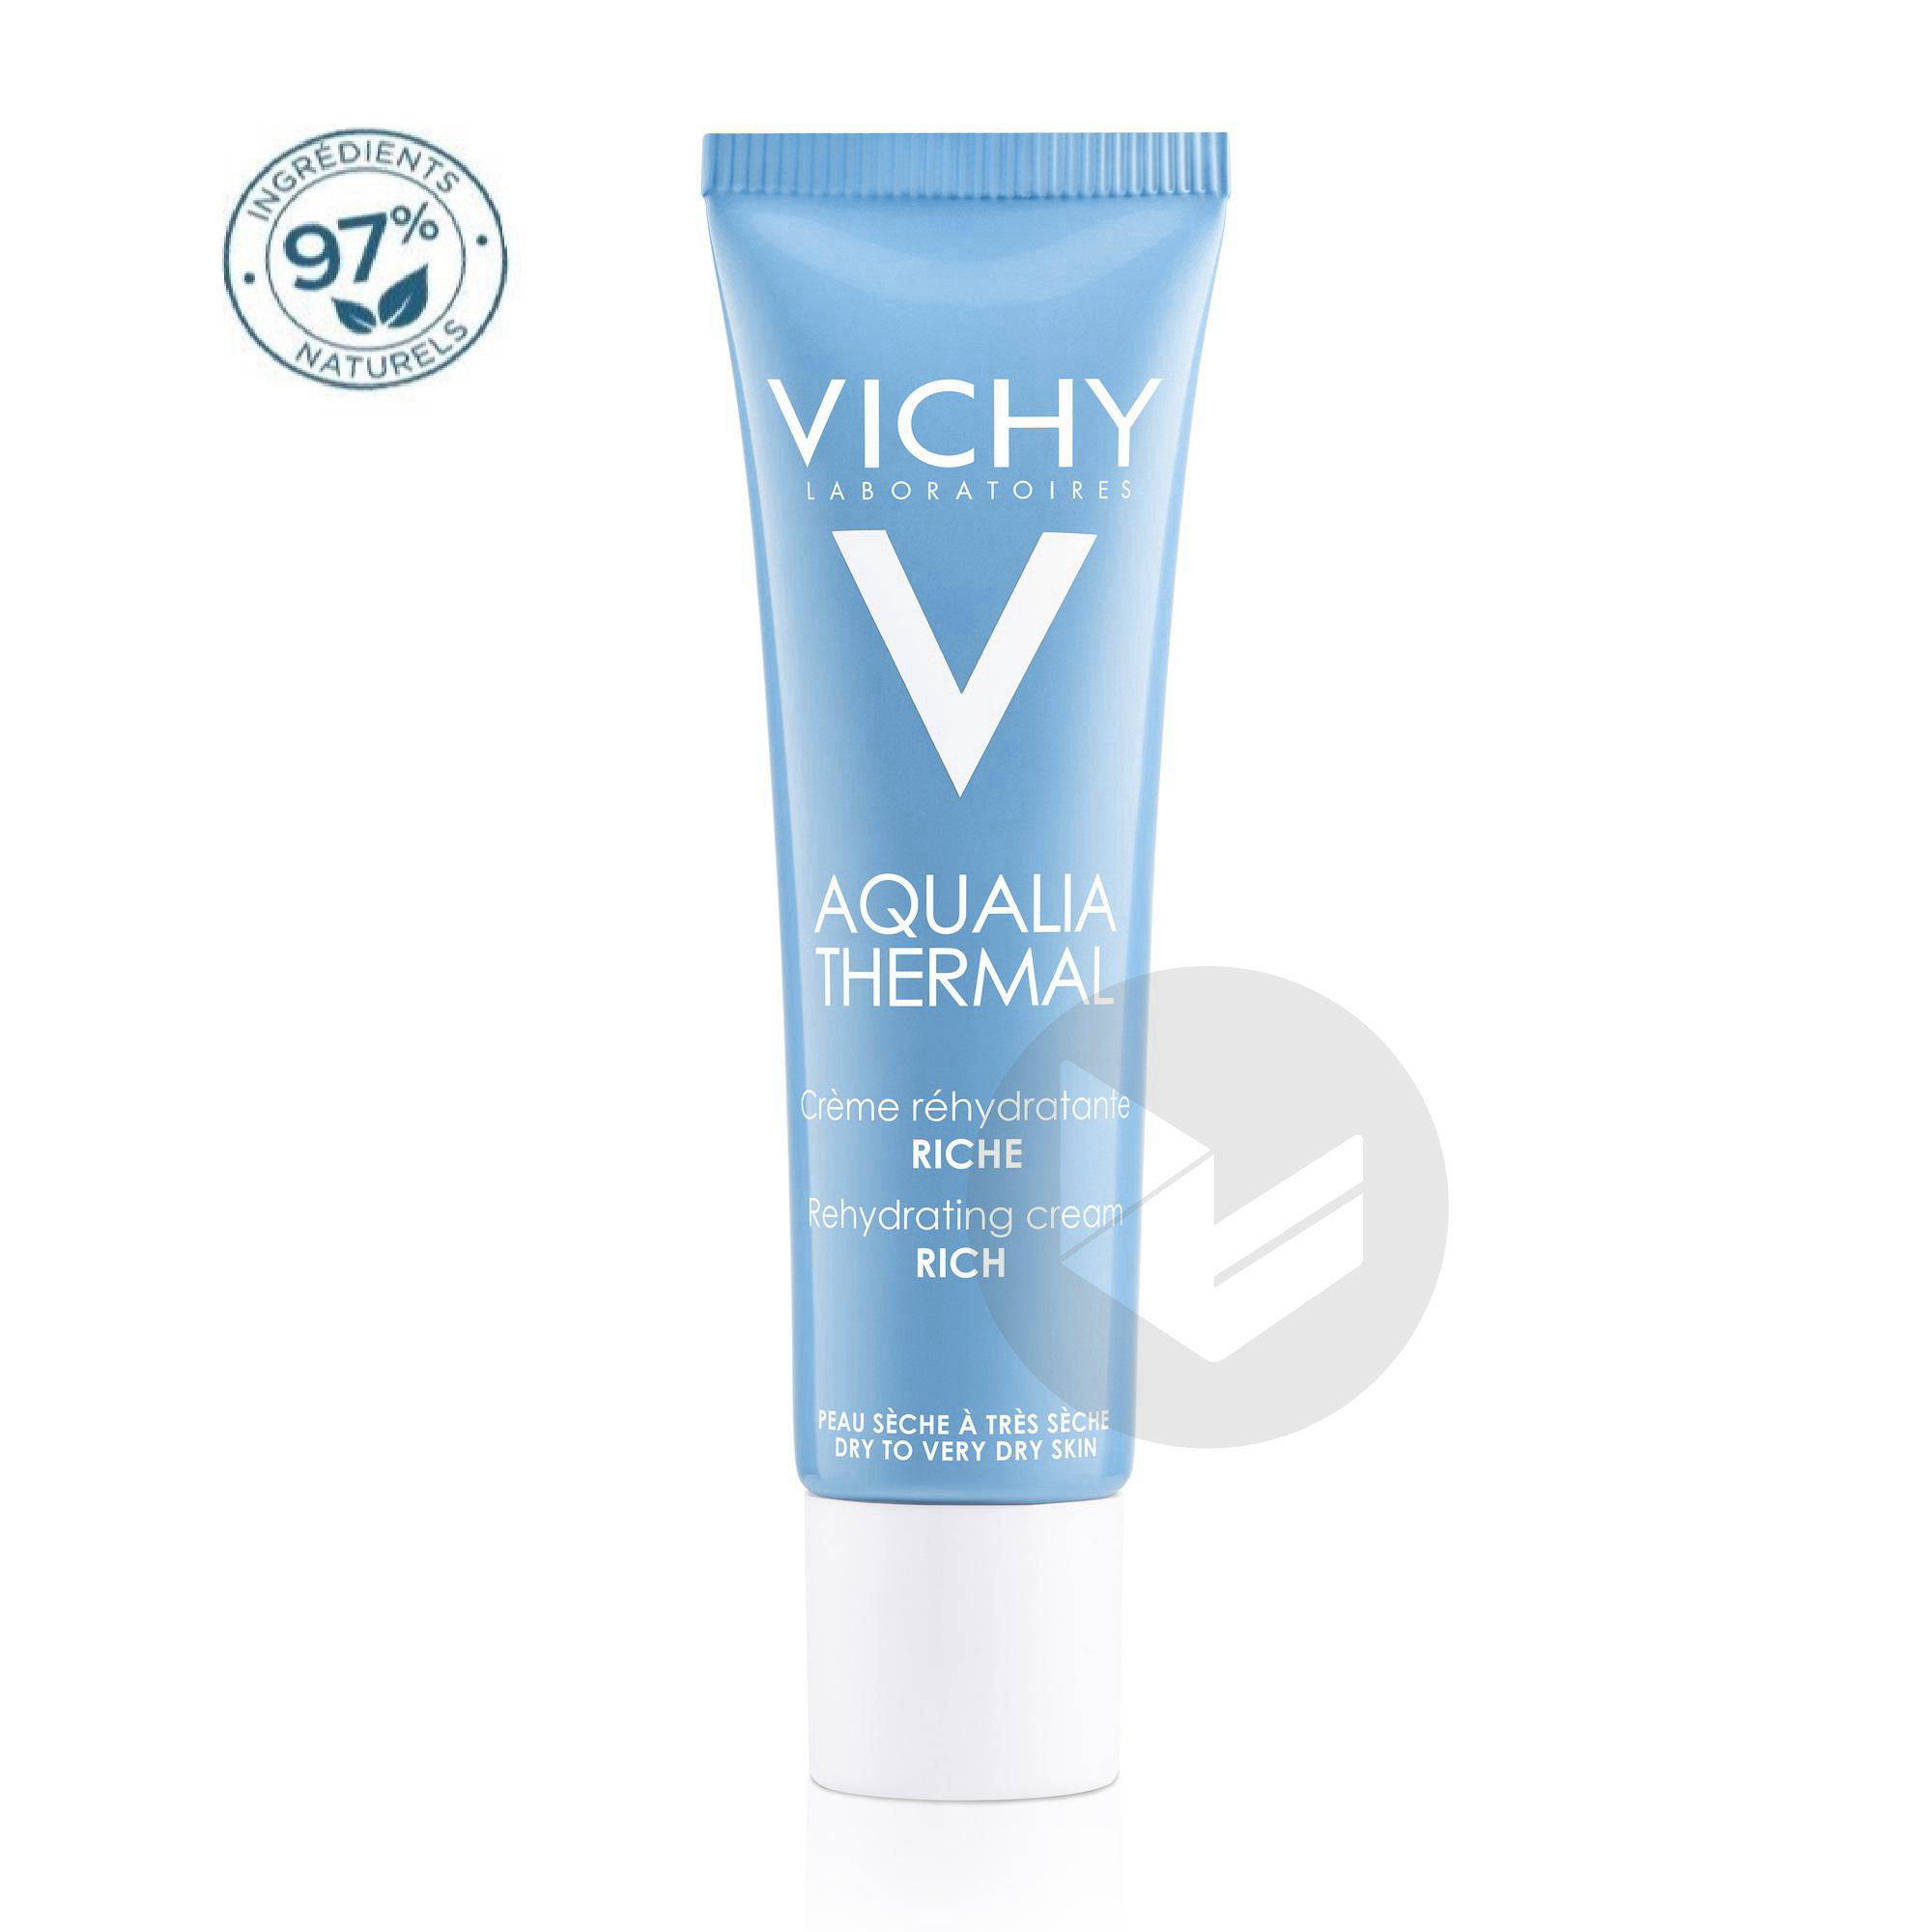 Aqualia Thermal Creme Rehydratante Riche 30 Ml